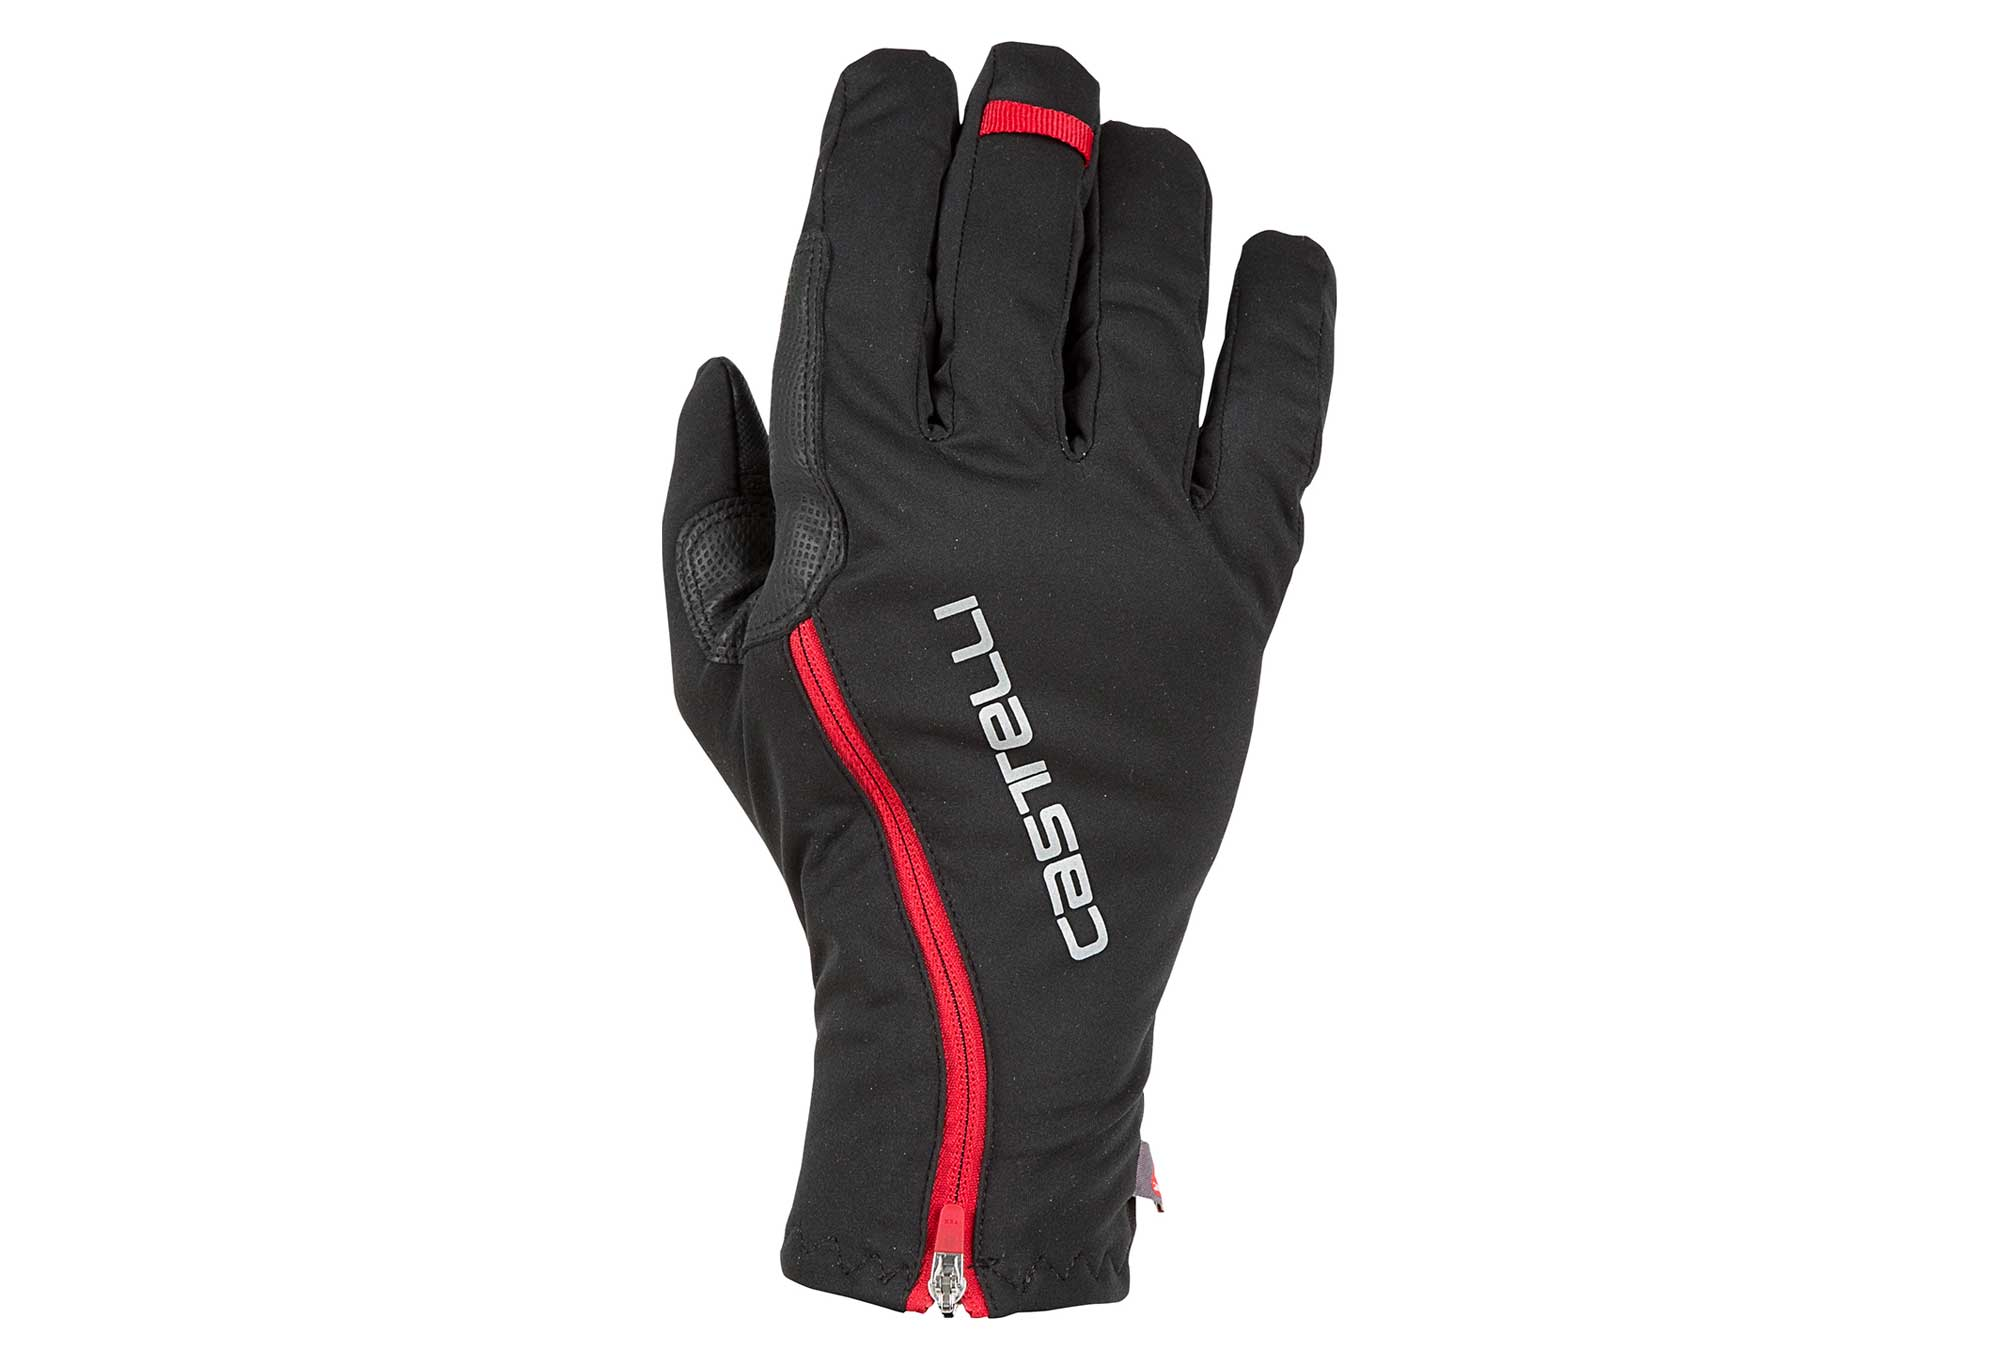 Castelli Spettacolo RoS Winter Gloves Black Red